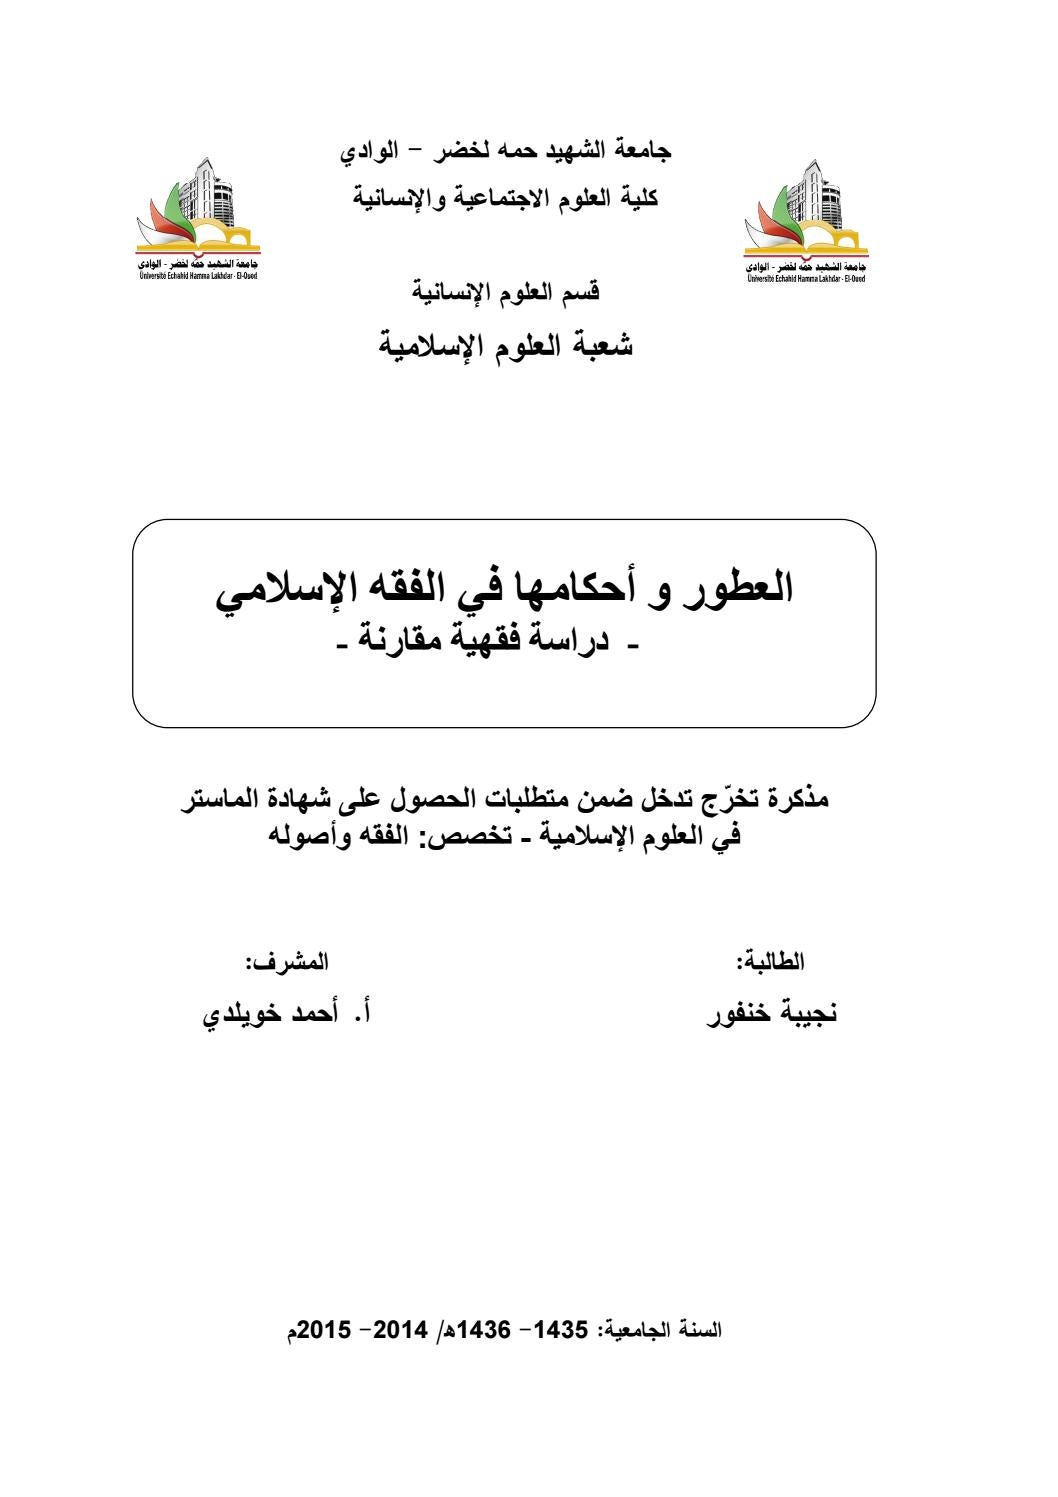 fd9d2750e العطور واحكامها في الفقه الاسلامي by Adel Almohsen - issuu